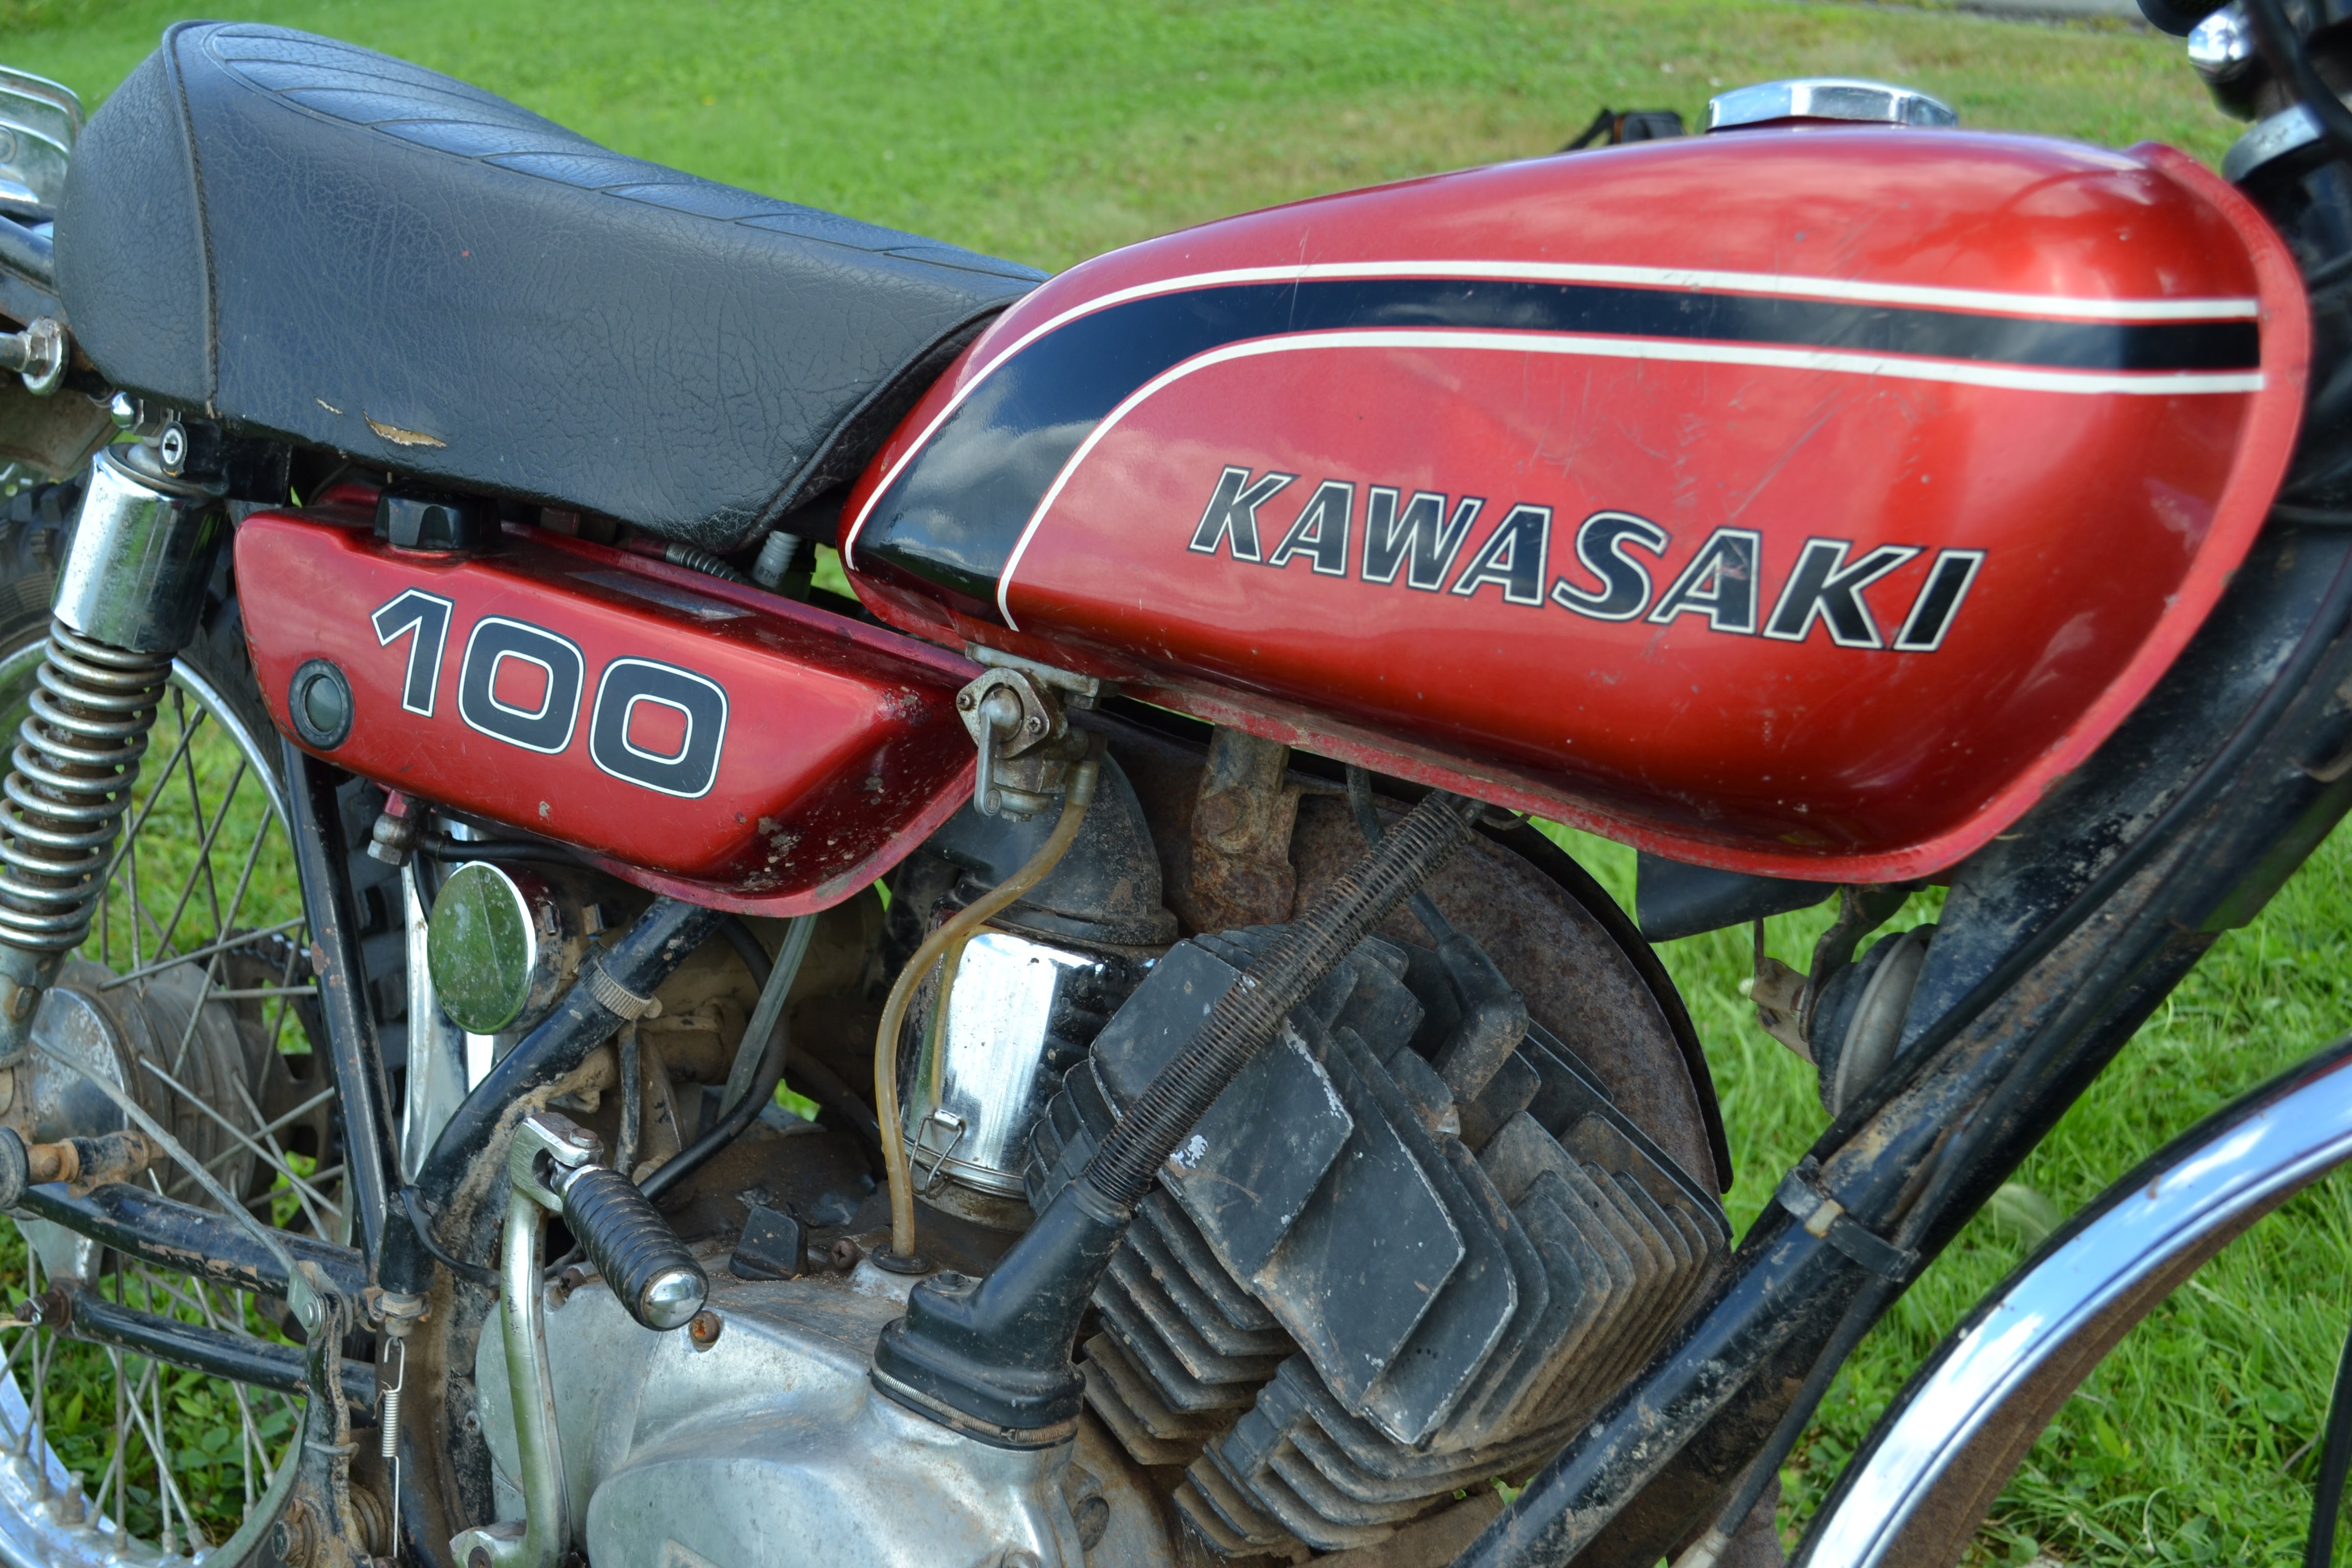 1976 Kawasaki Ke100 Wiring Diagram Free Download 1974 G4 Tr 100 Home Moreover 1975 G5 Furthermore